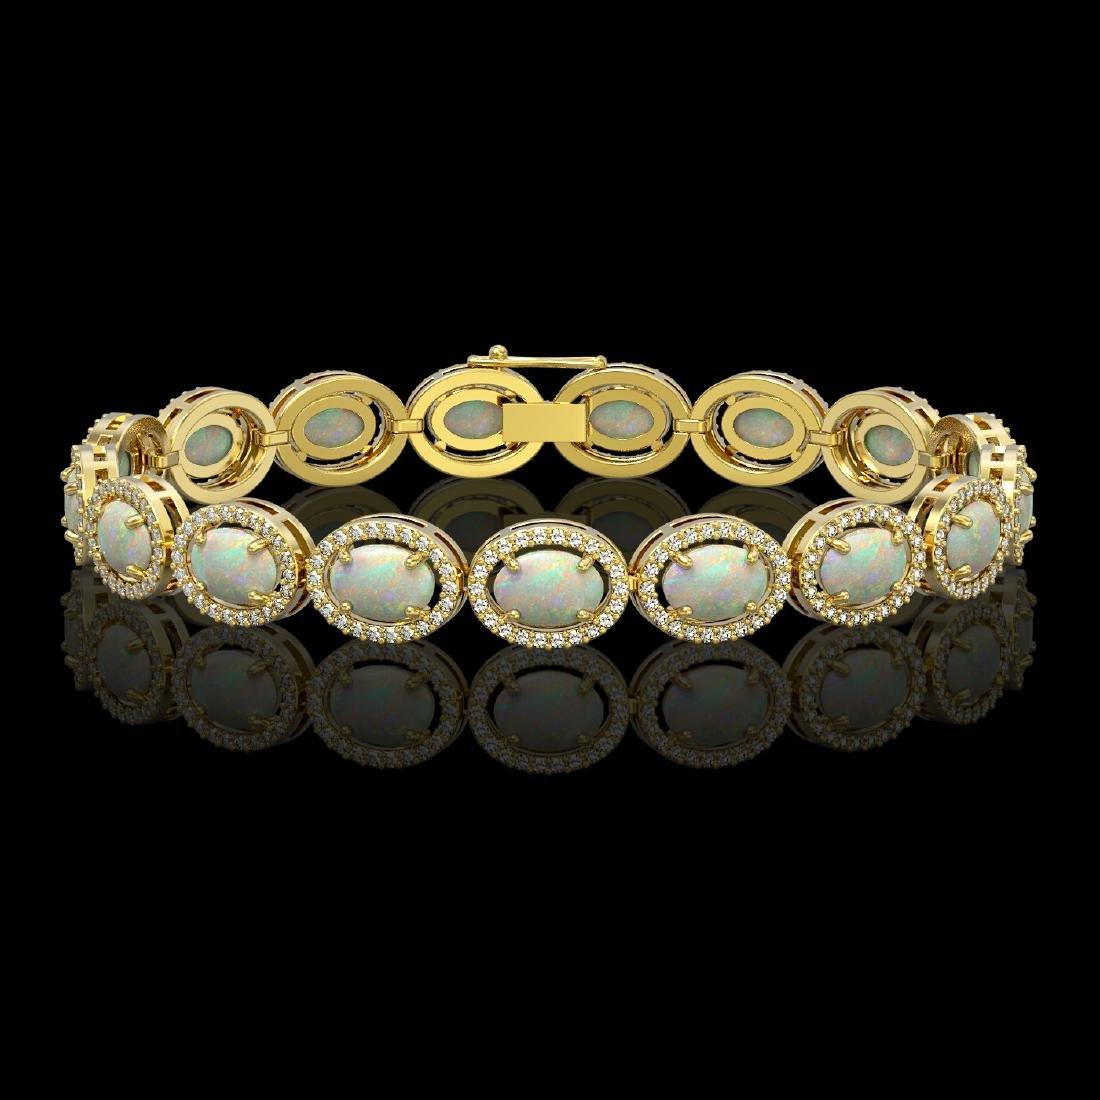 14.24 CTW Opal & Diamond Halo Bracelet 10K Yellow Gold